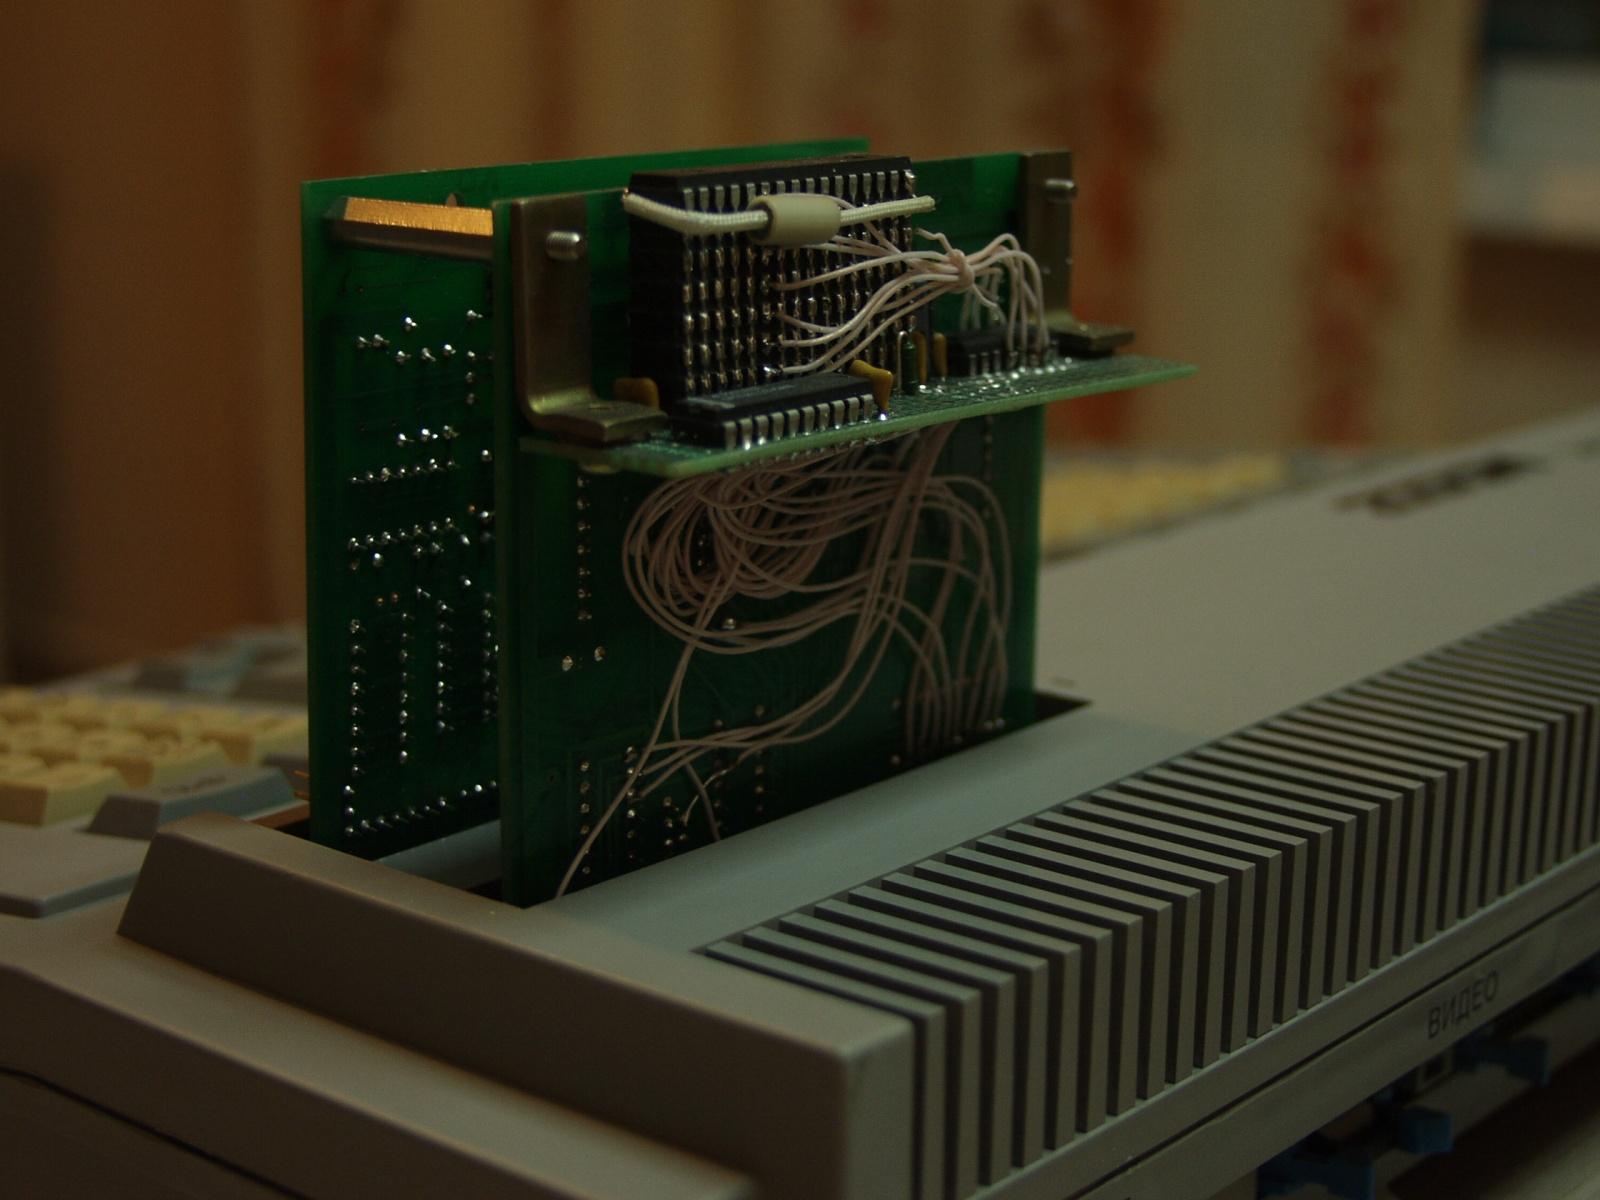 Советская IBM-PC Электроника МС-1502 - 7